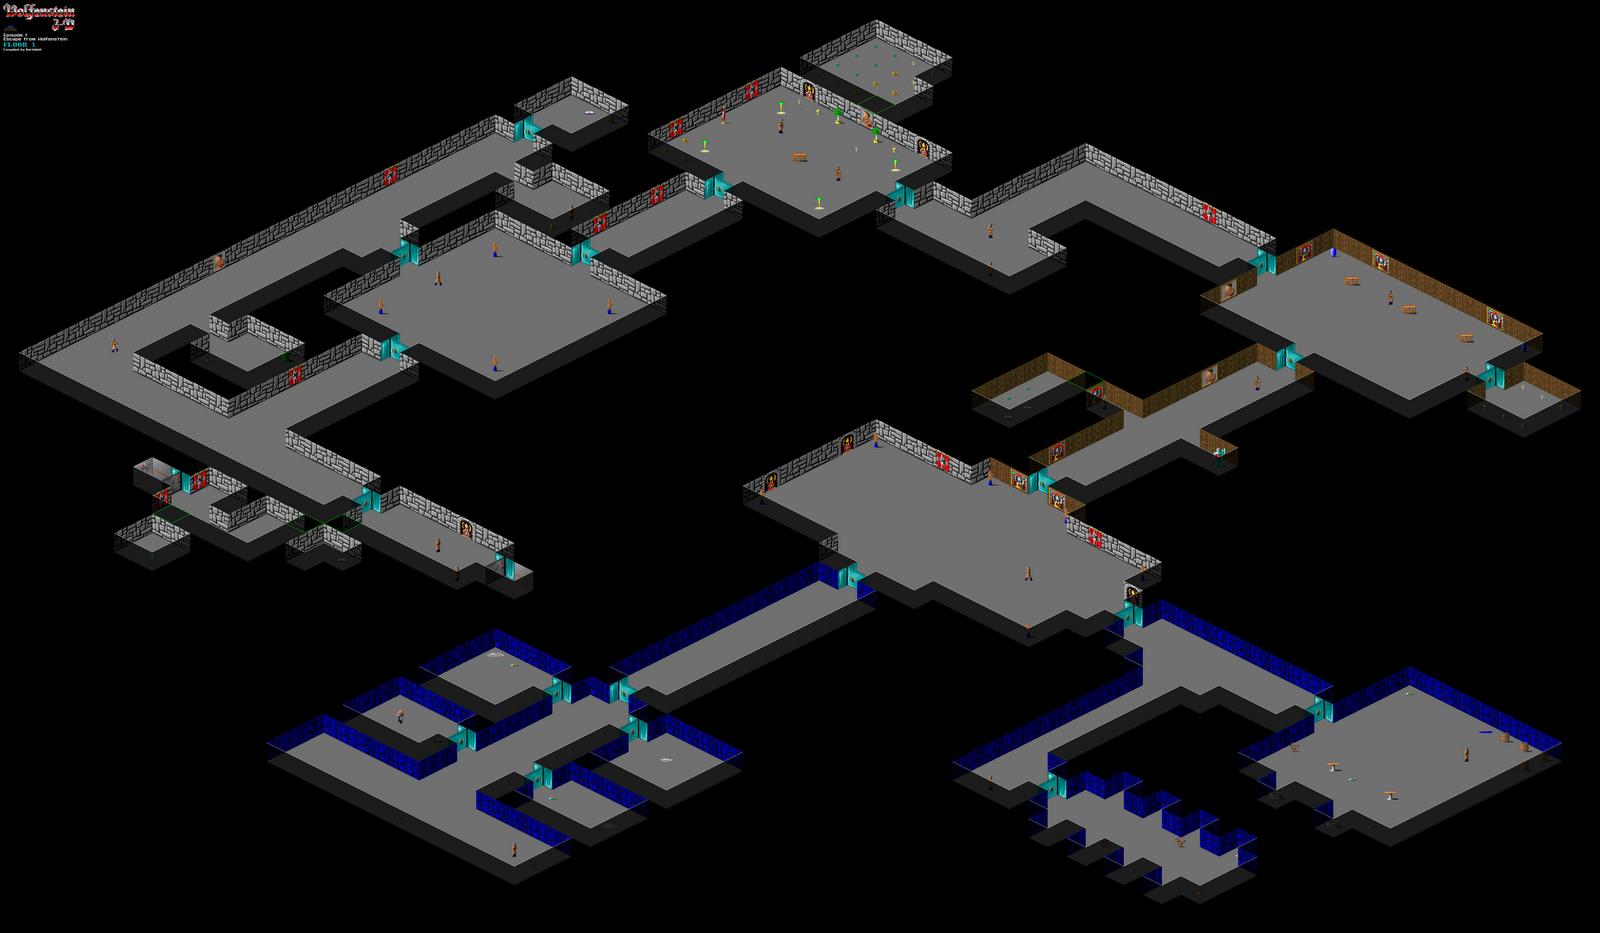 The wolfenstein 3d blog may 2011 for Floor 2 map swordburst 2